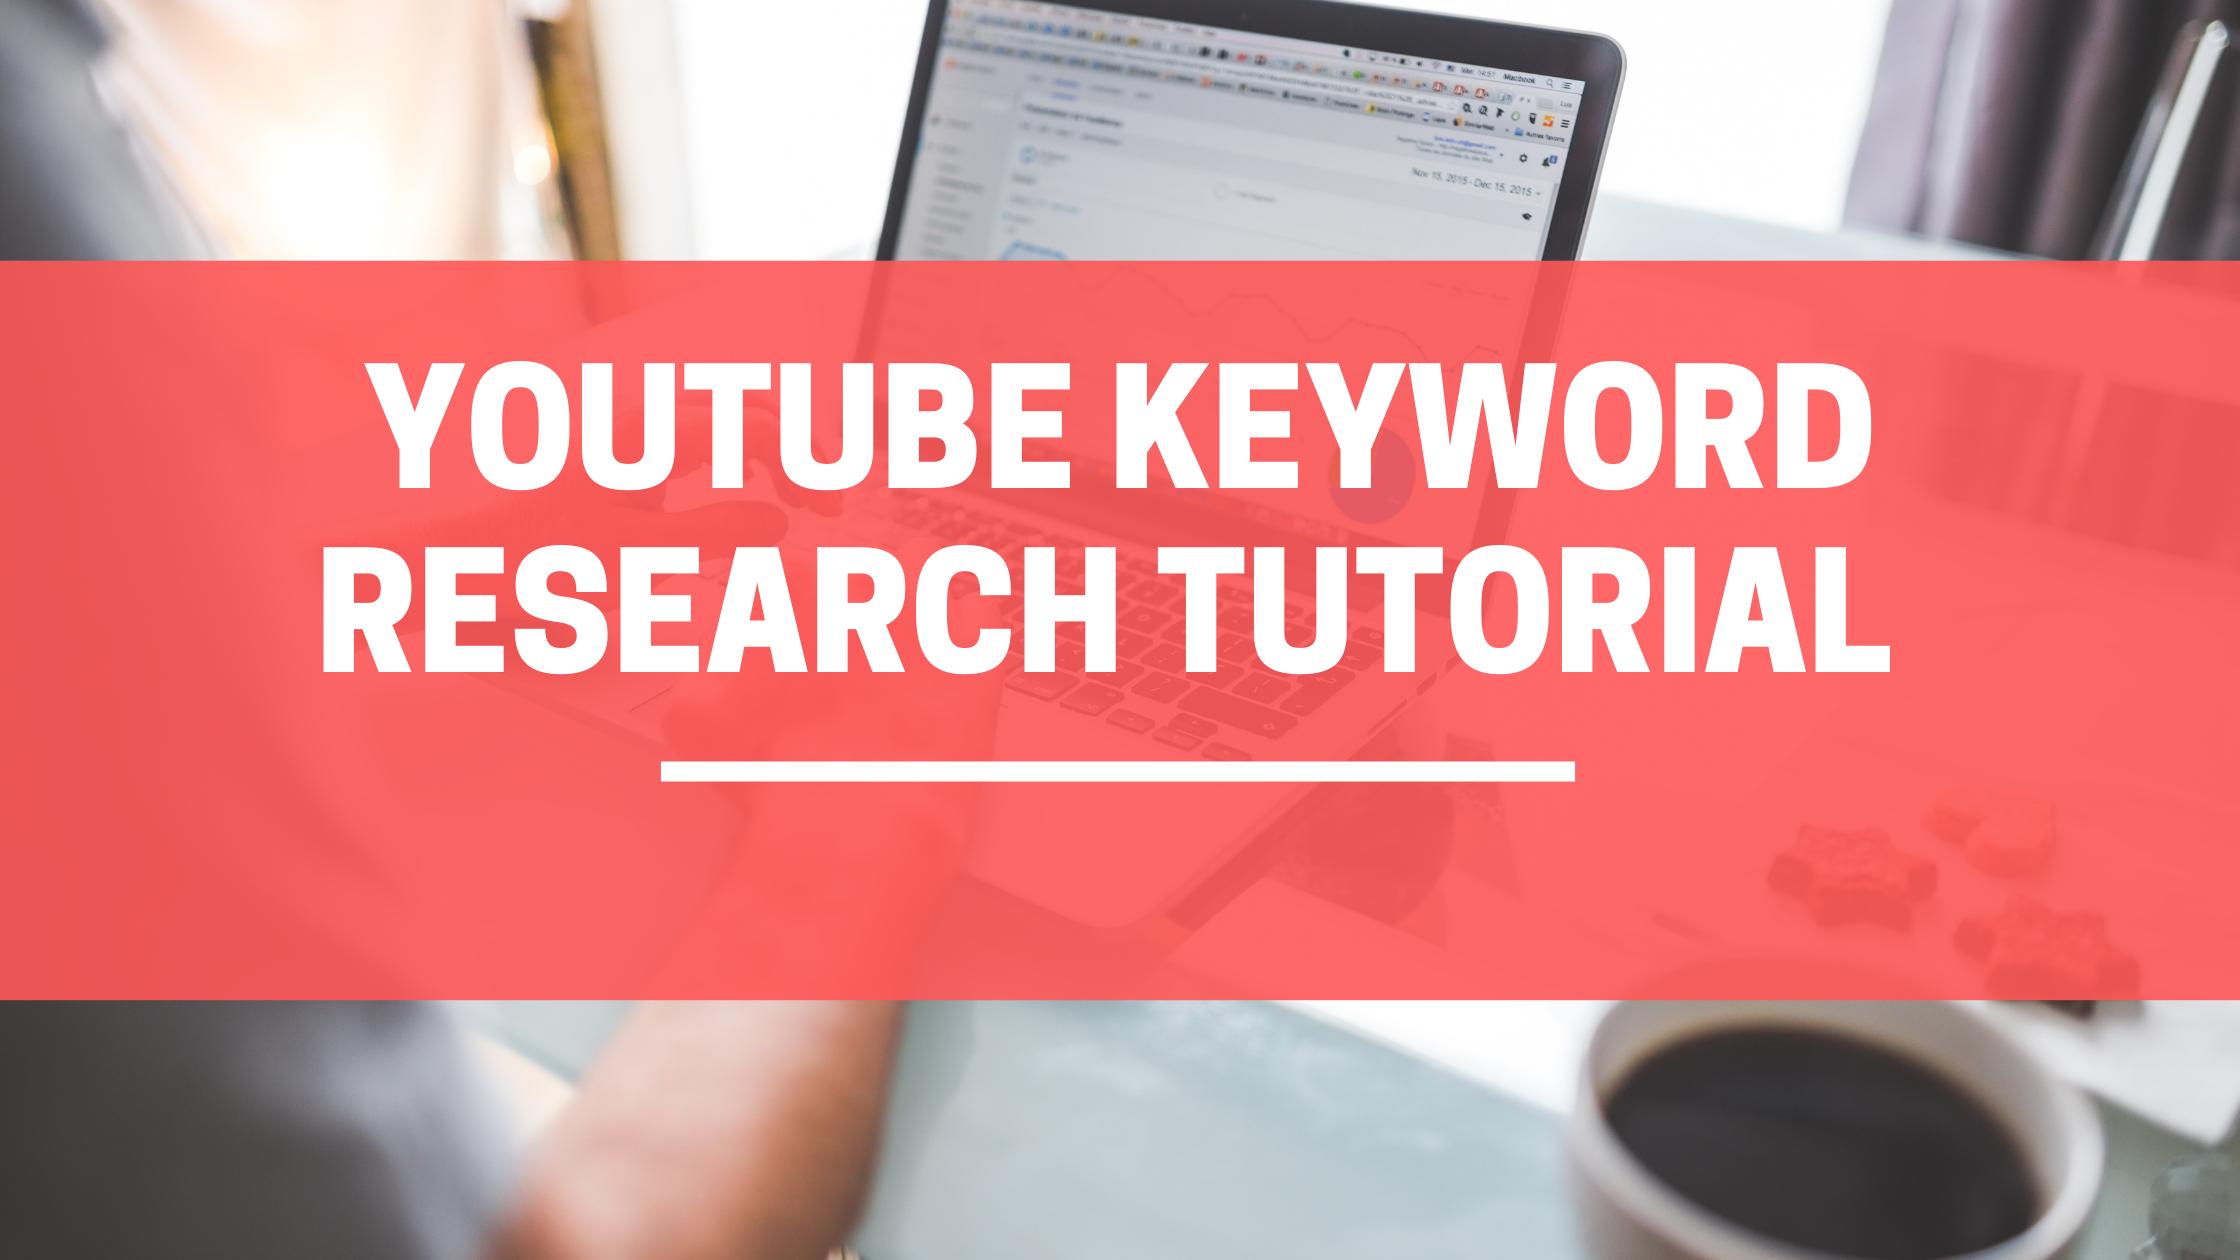 youtube keyword research tutorial